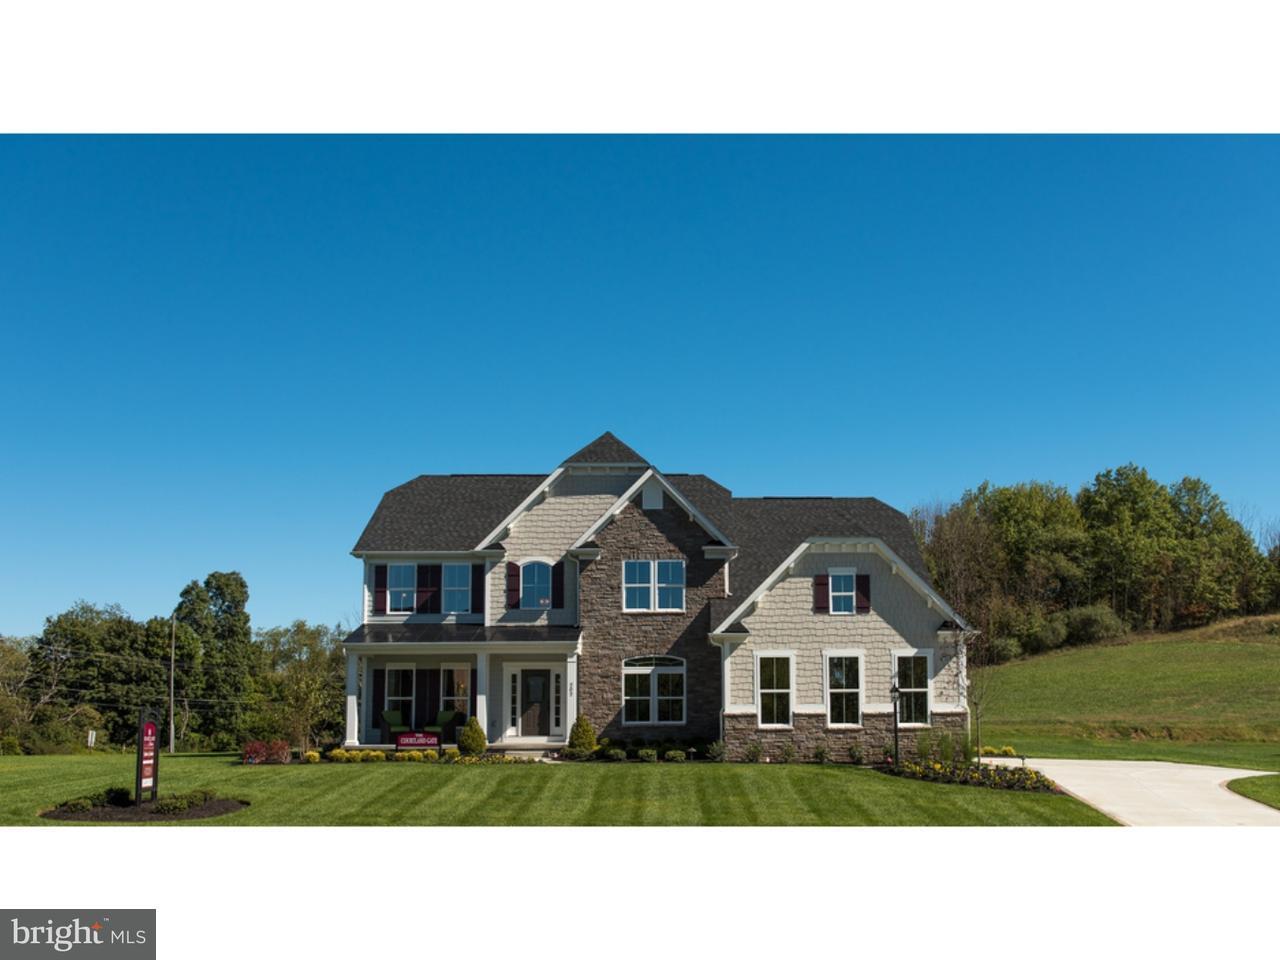 独户住宅 为 销售 在 5 PEAR TREE Court Delran Township, 新泽西州 08075 美国